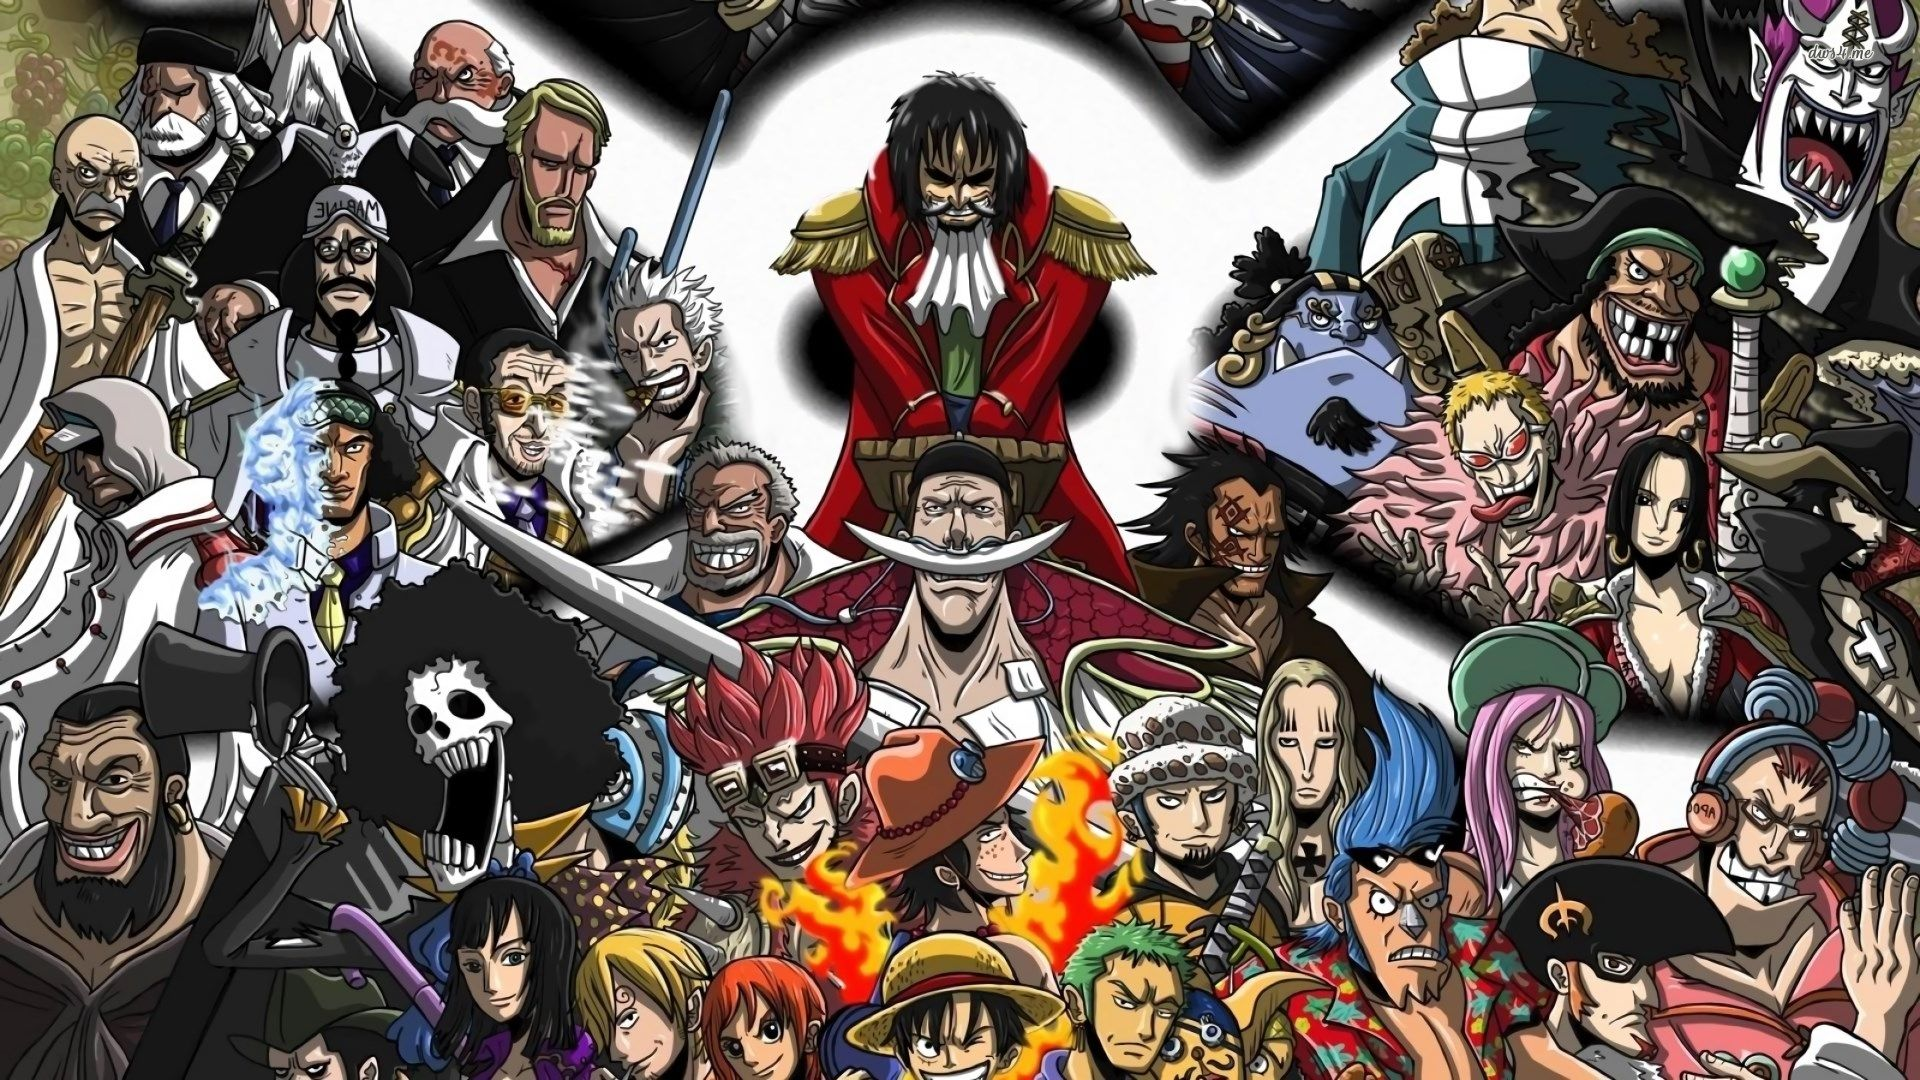 One Piece Wallpaper Full Hd - One Piece Full Hd , HD Wallpaper & Backgrounds